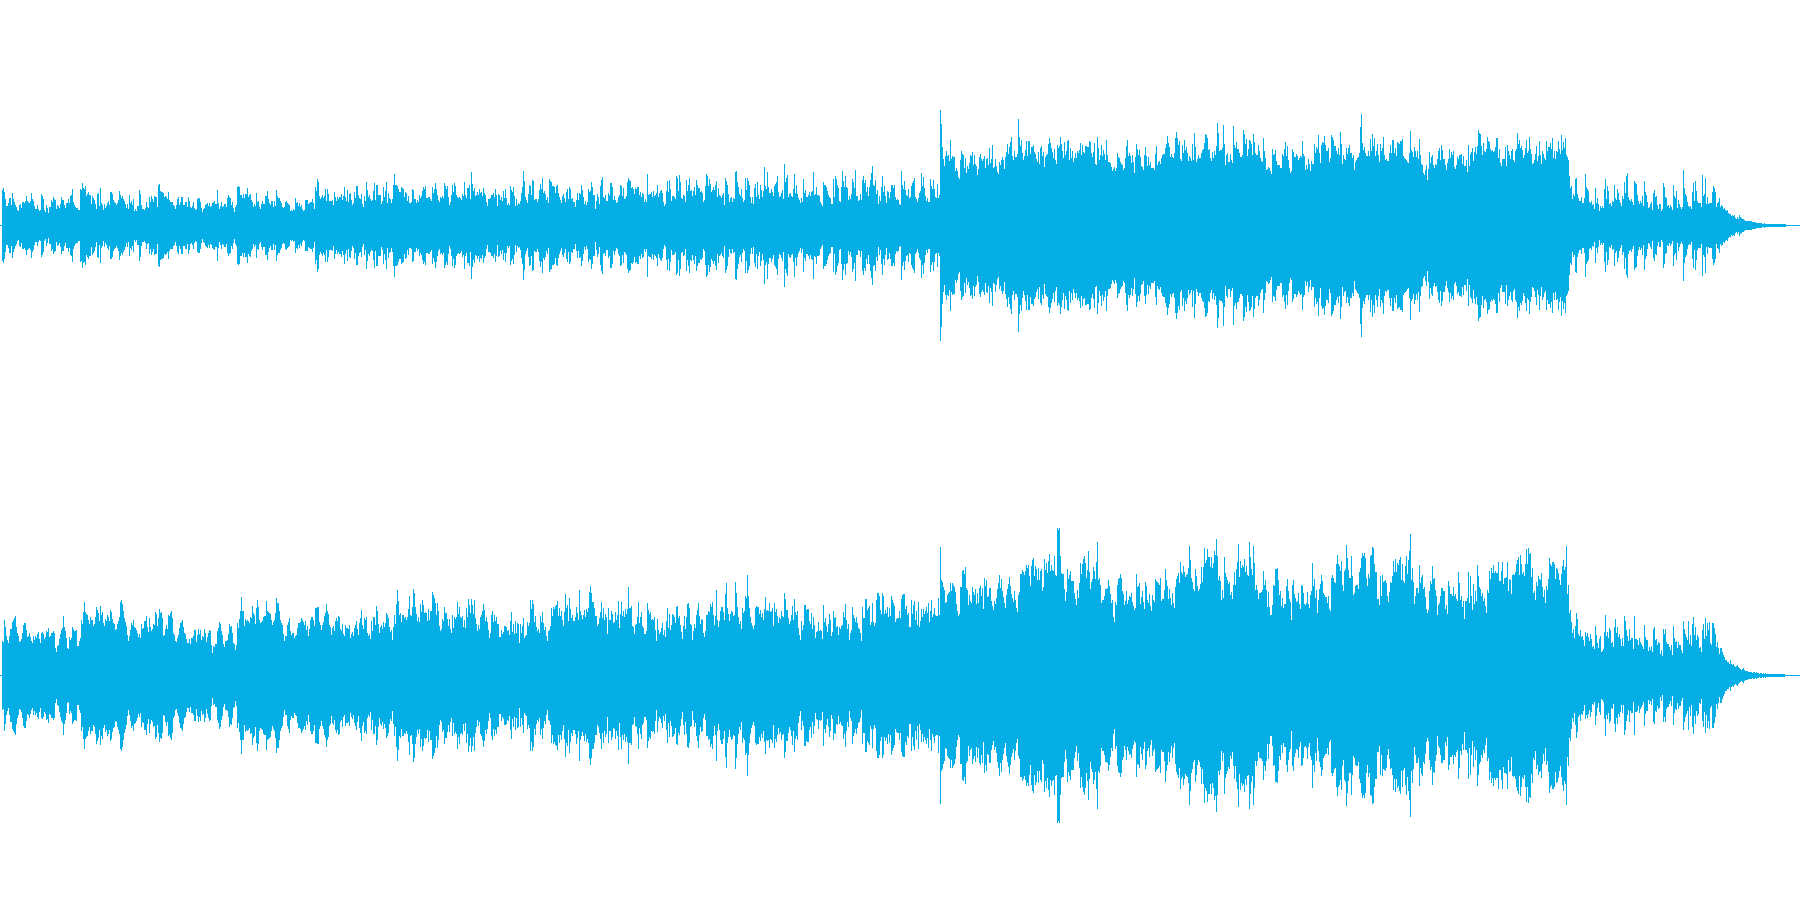 SF映画音楽のような空気感のある曲の再生済みの波形